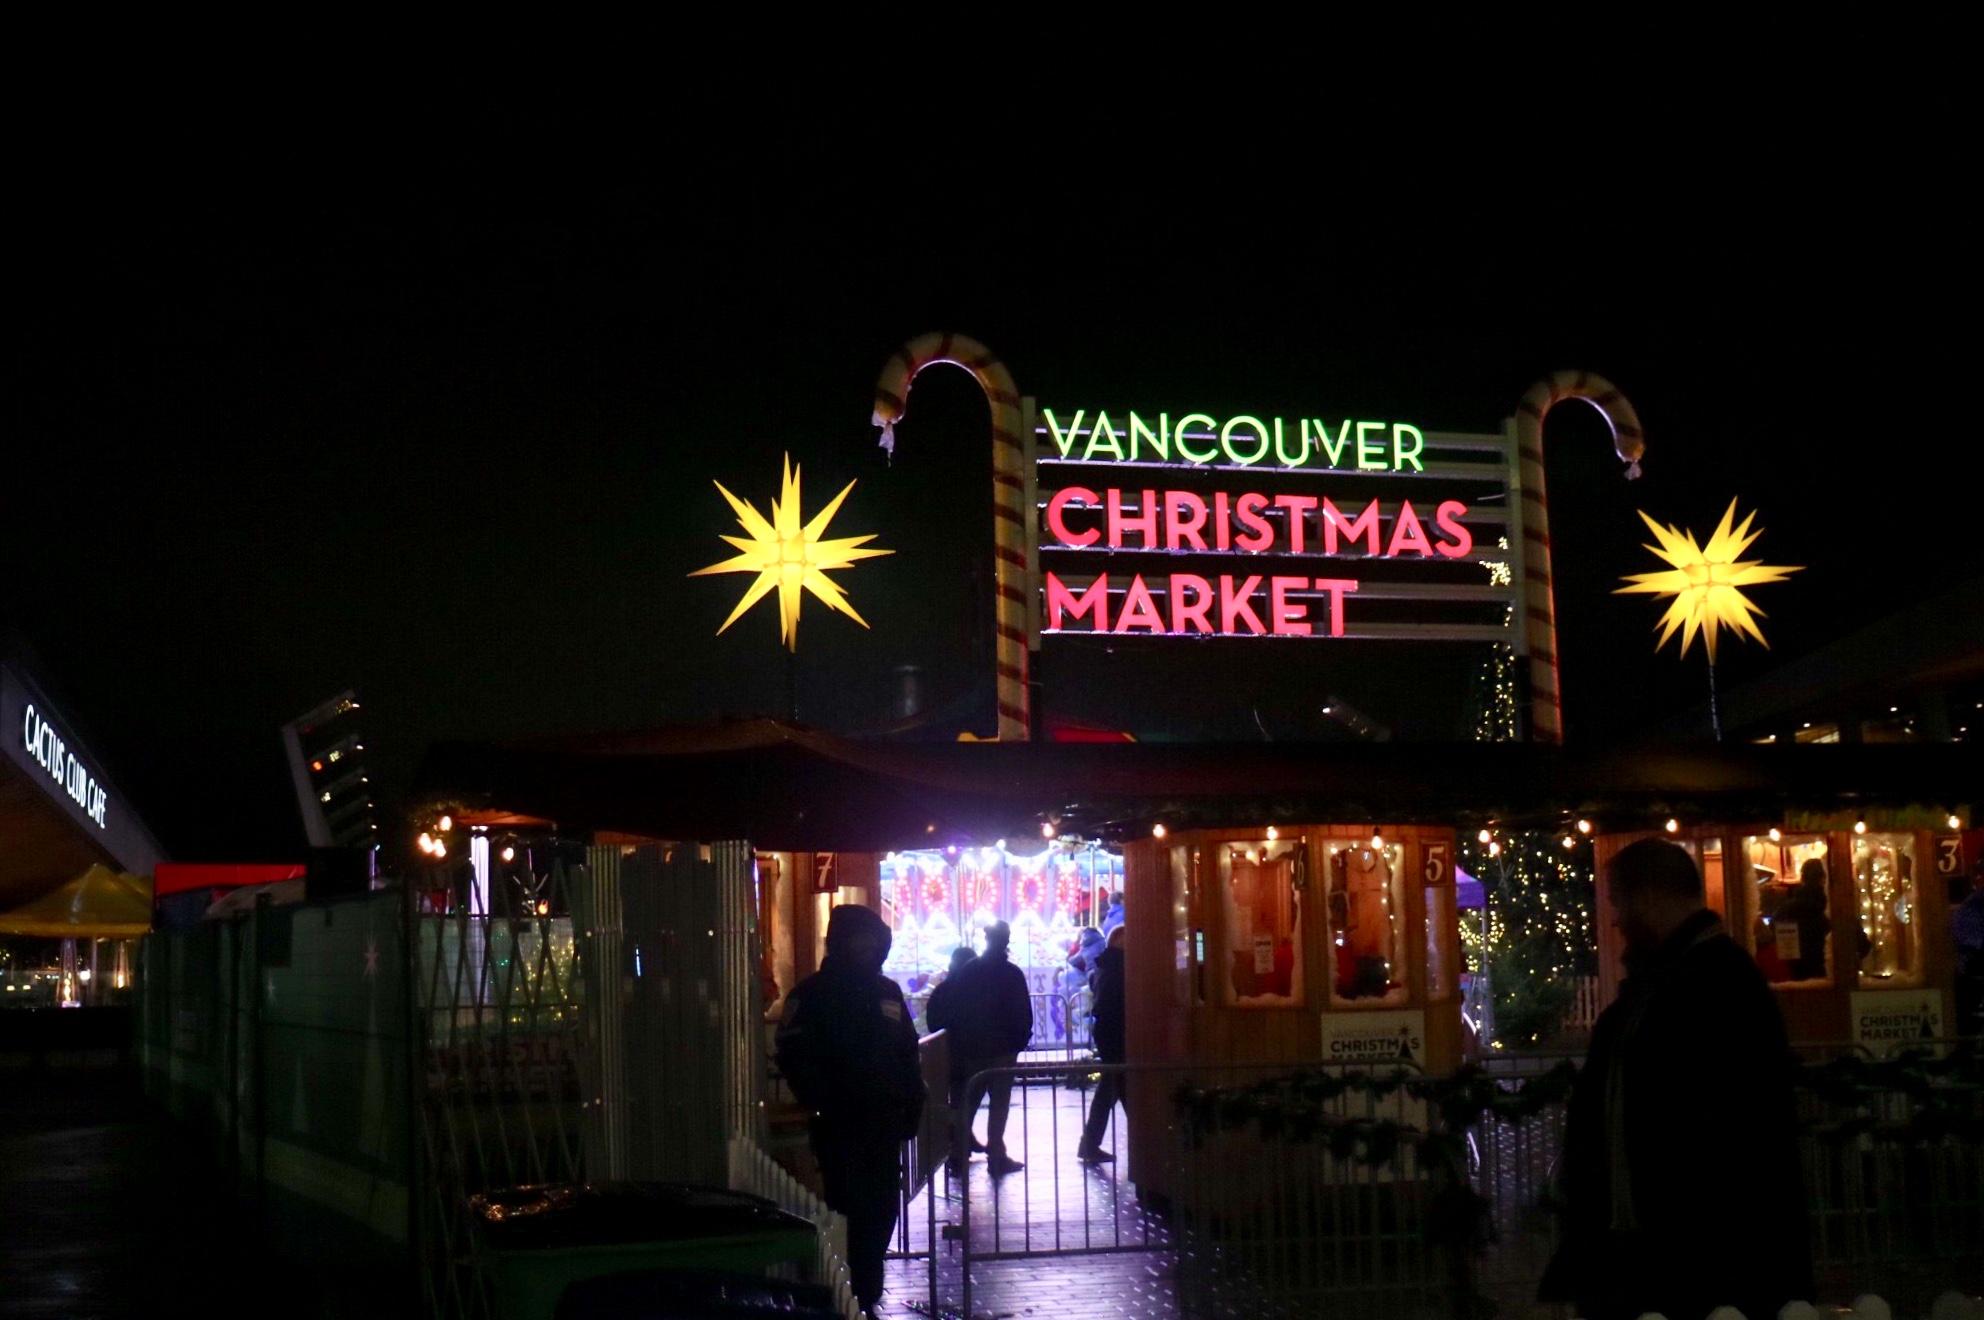 Vancouver Christmas Market.Vancouver Christmas Market 2017 Pickydiners Com